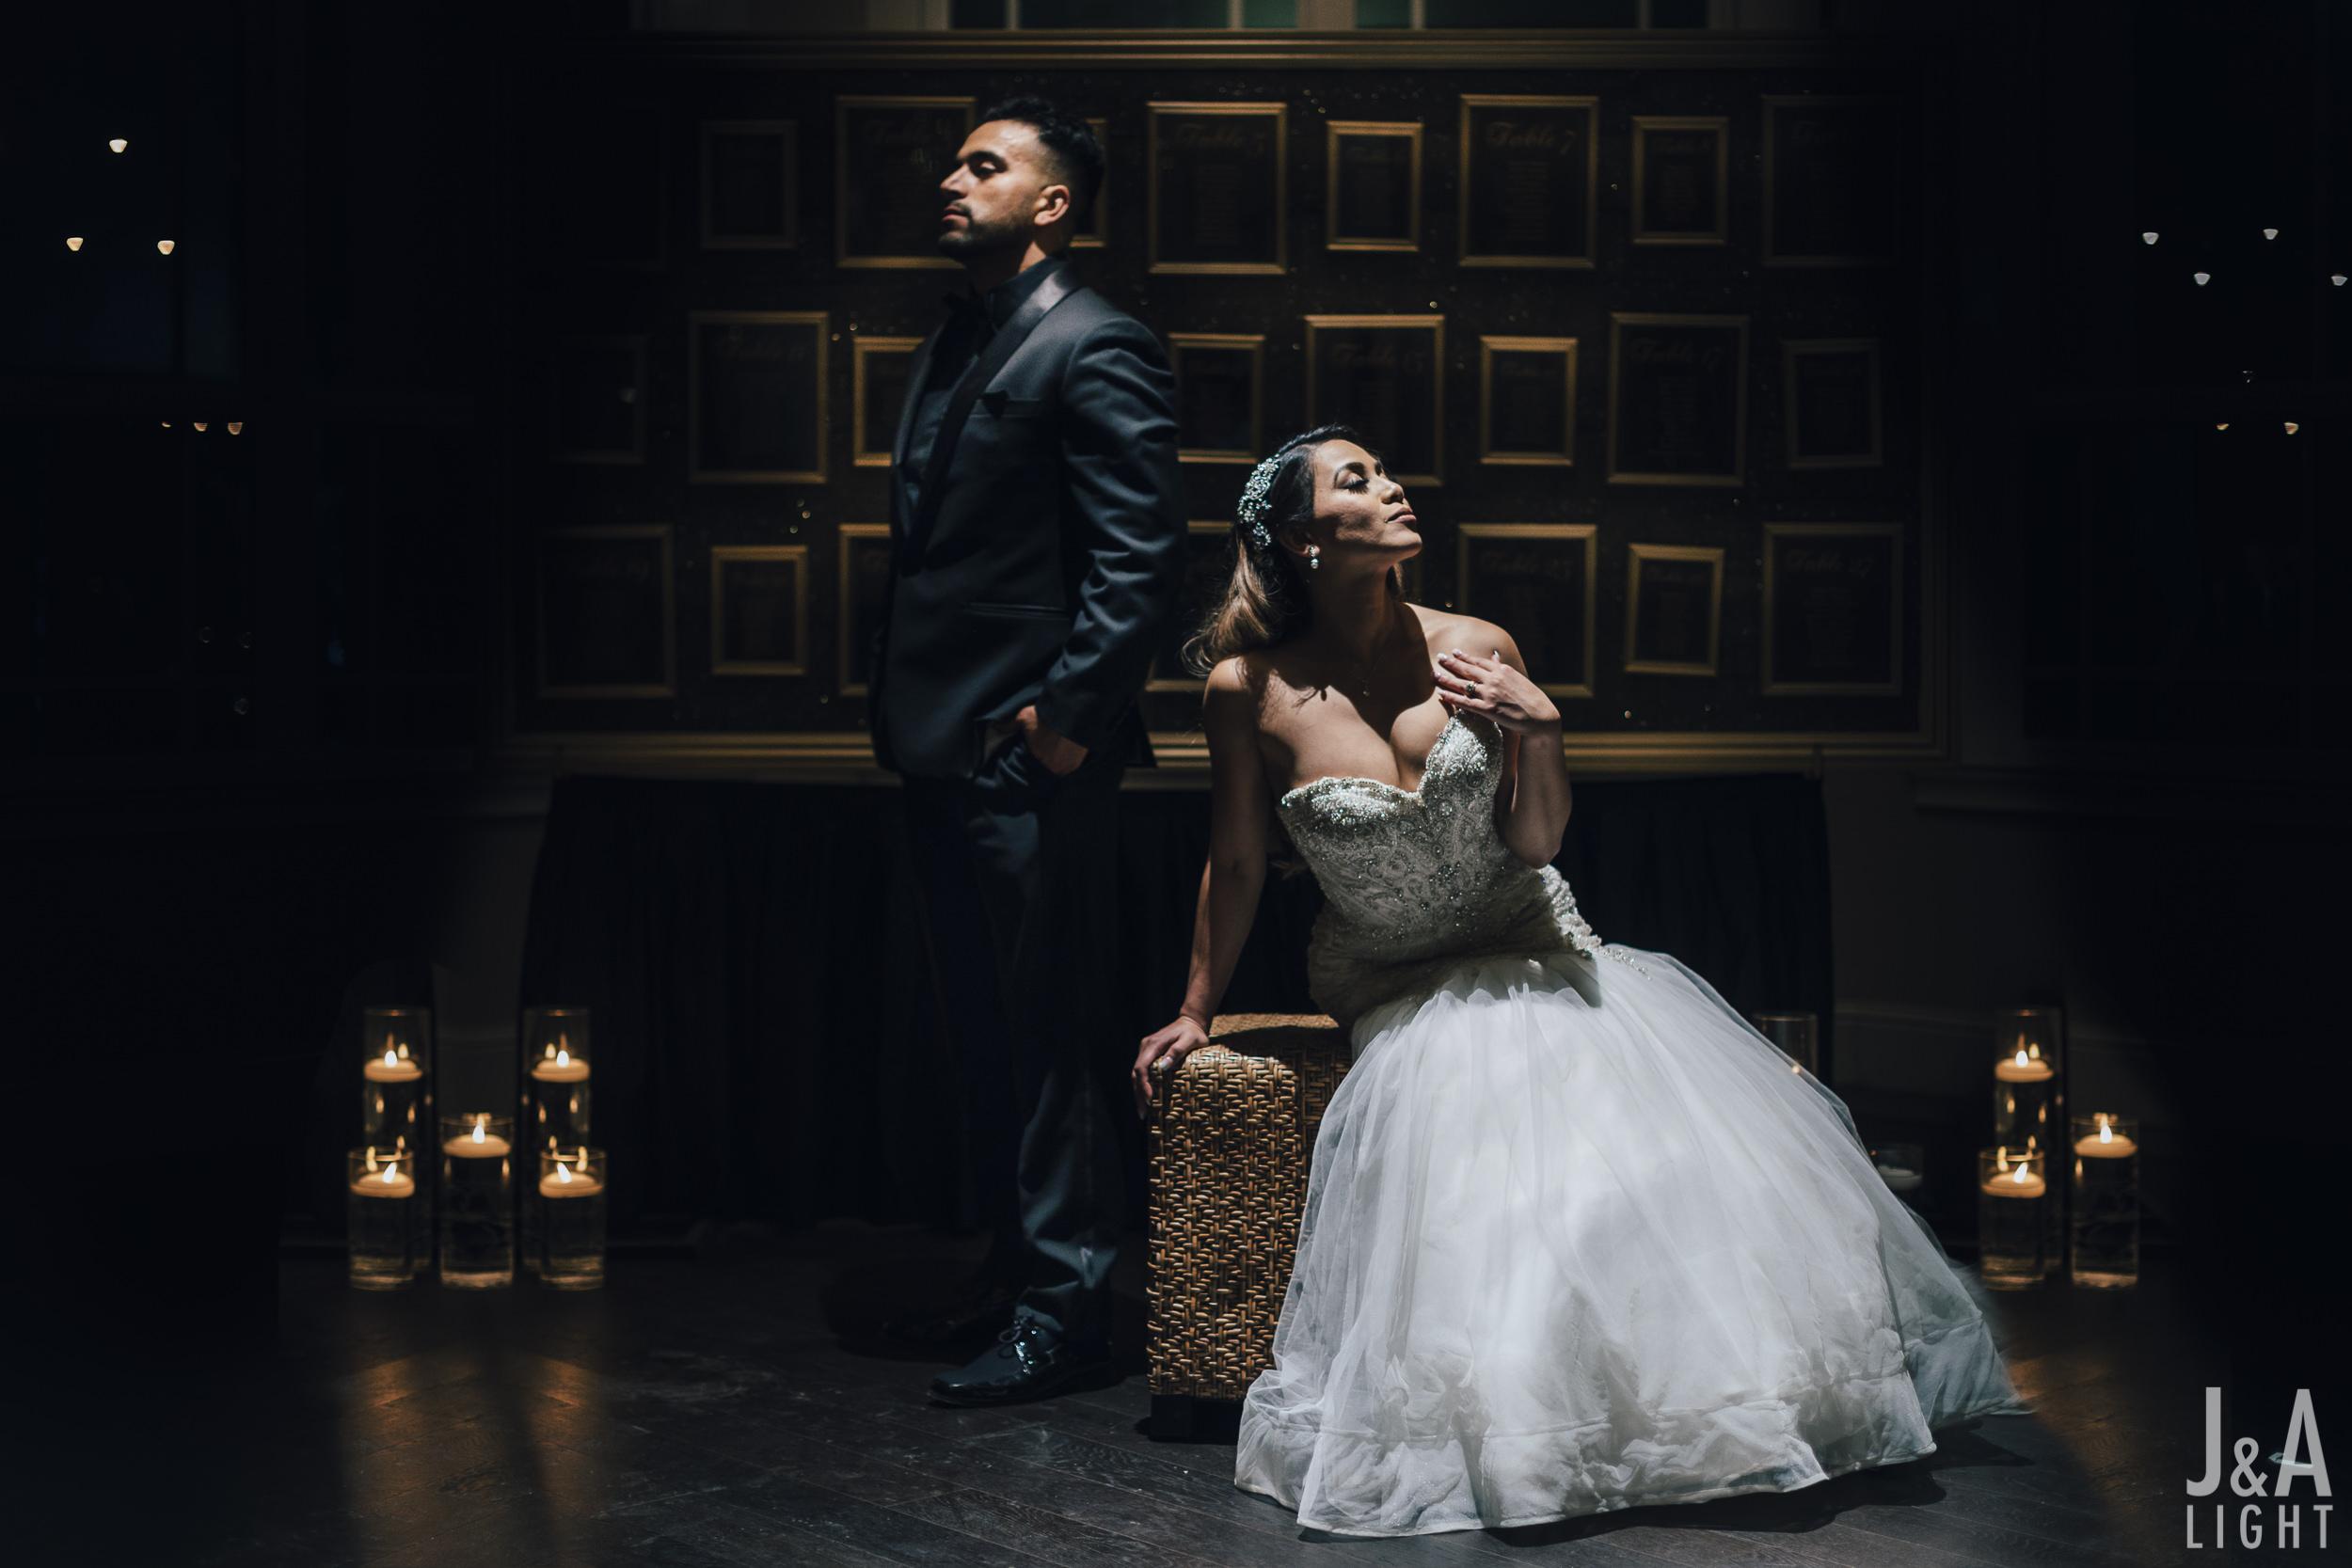 20171014-JanDan-LosBanos-GlassMansion-Wedding-Blog-098.jpg